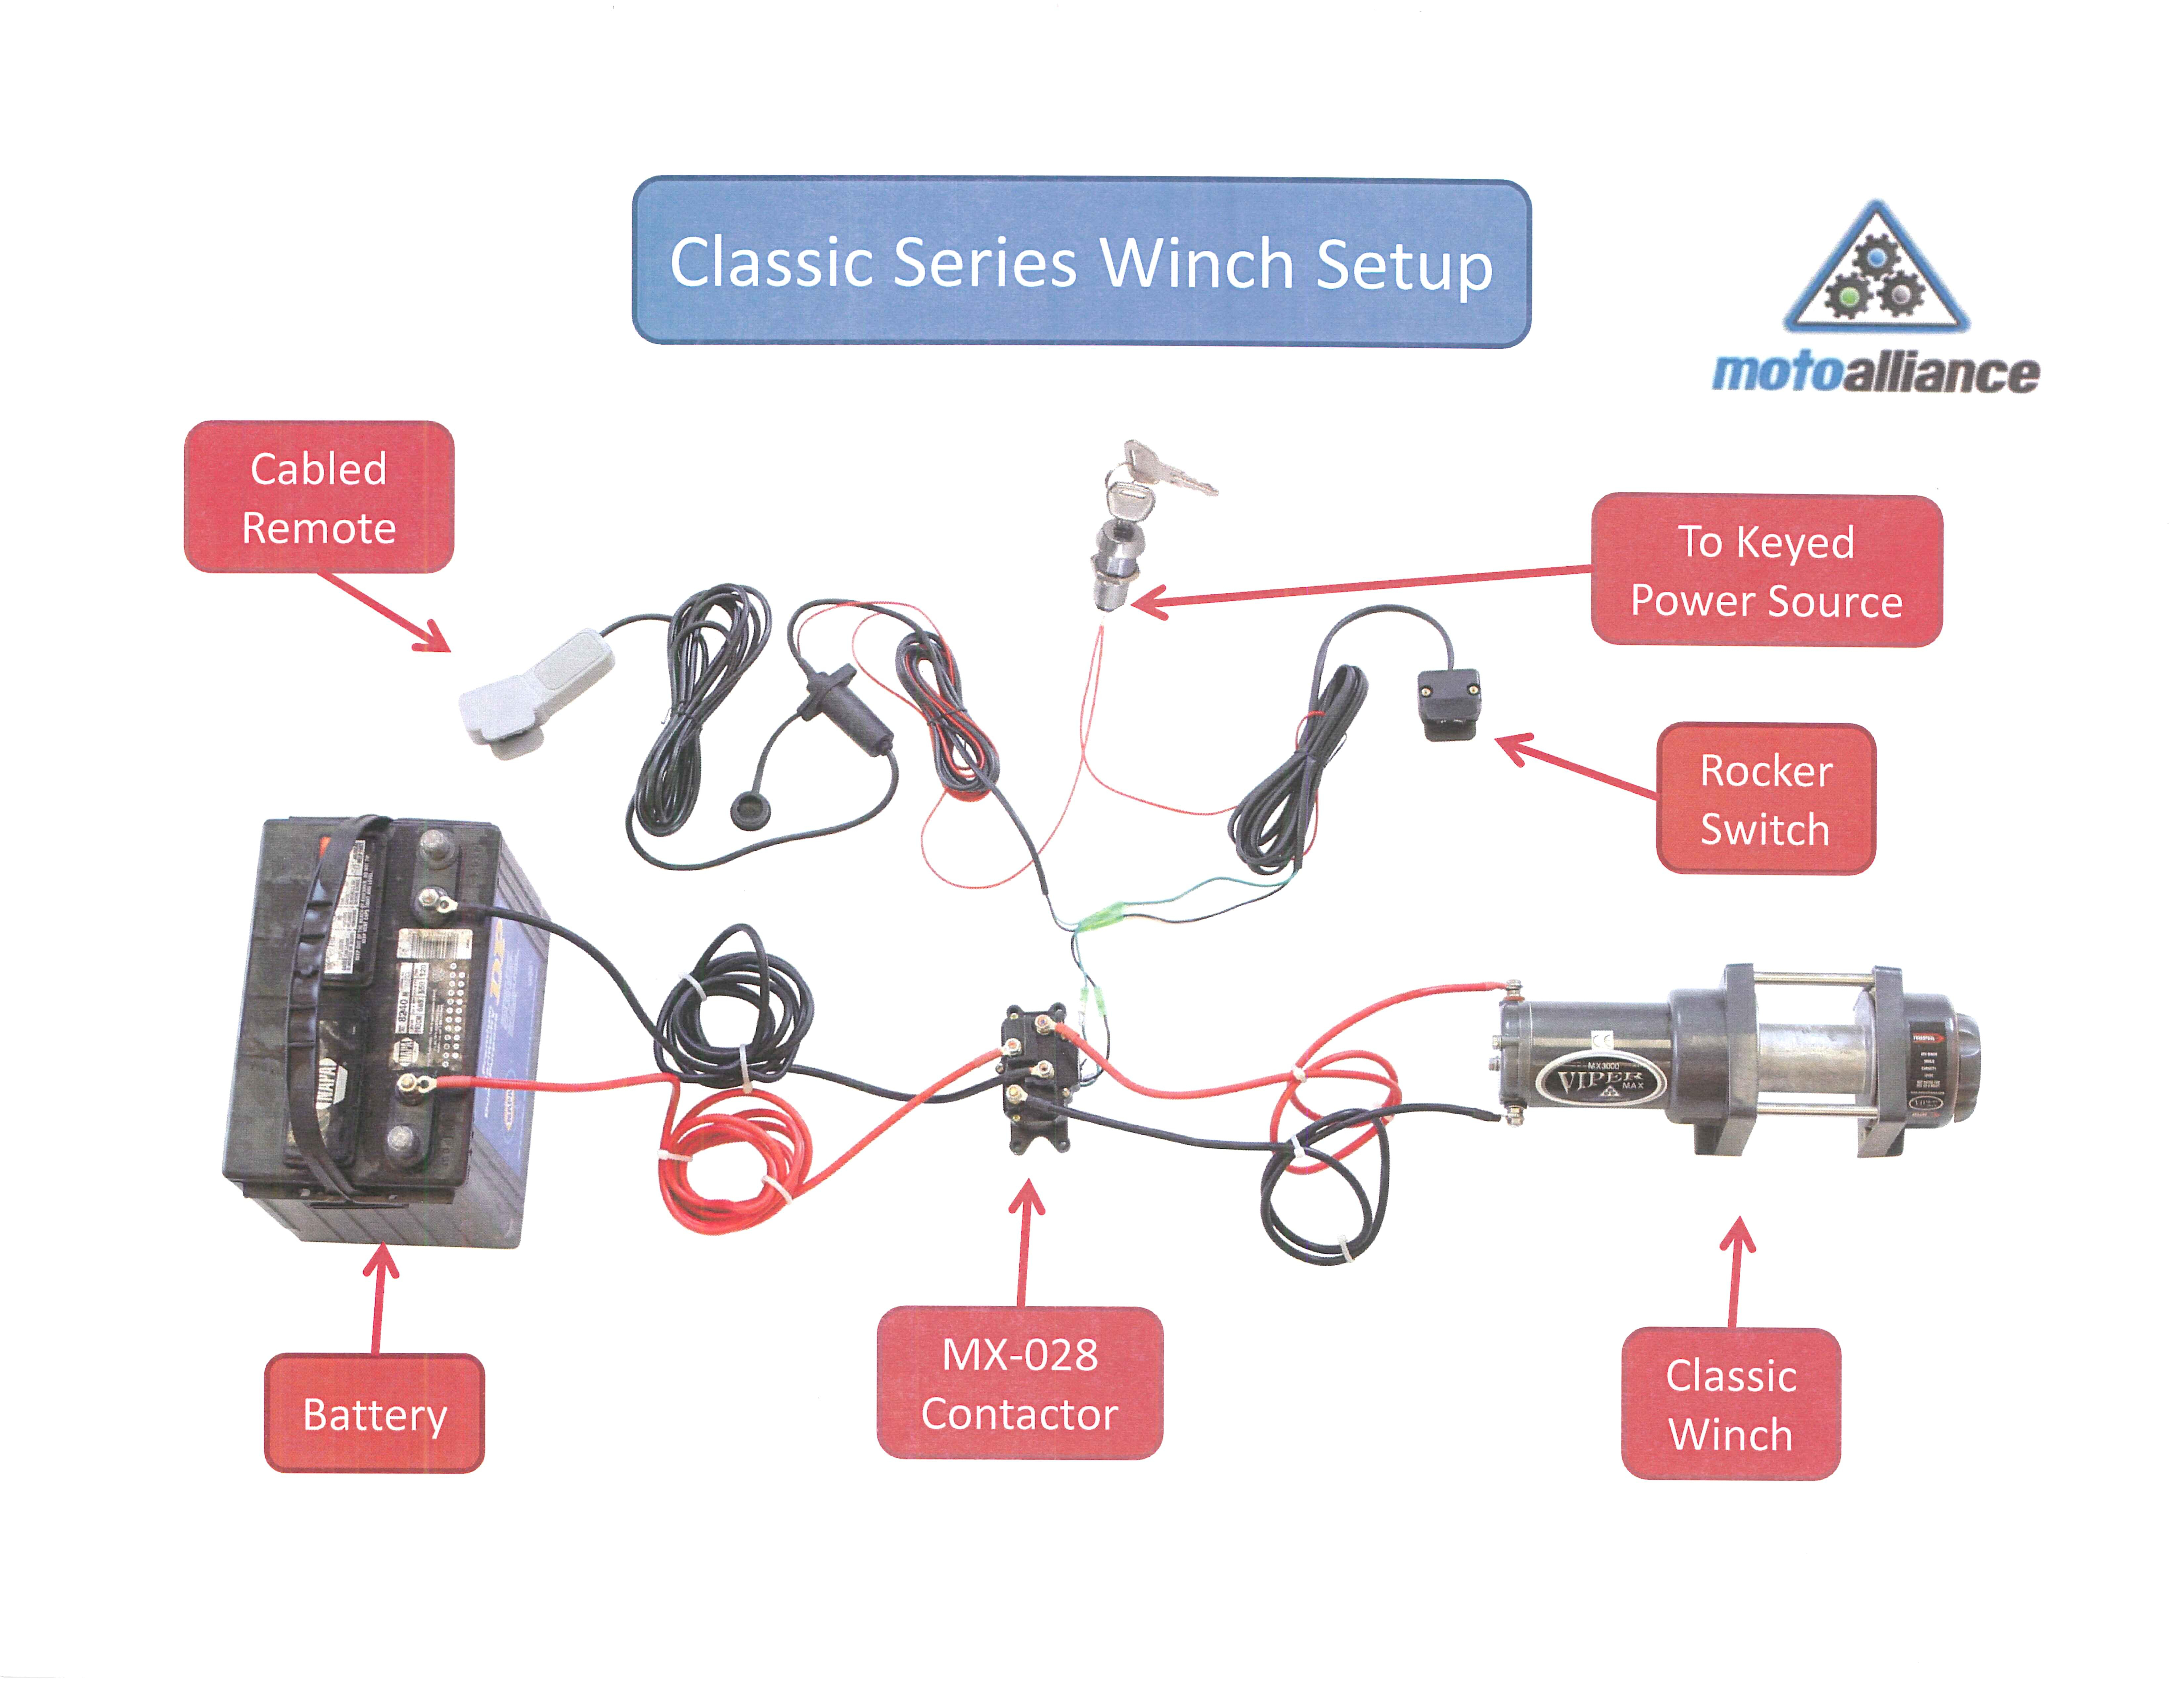 T Max 4500 Winch Wiring Diagram | Wiring Library - Warn Winch Wiring Diagram Solenoid